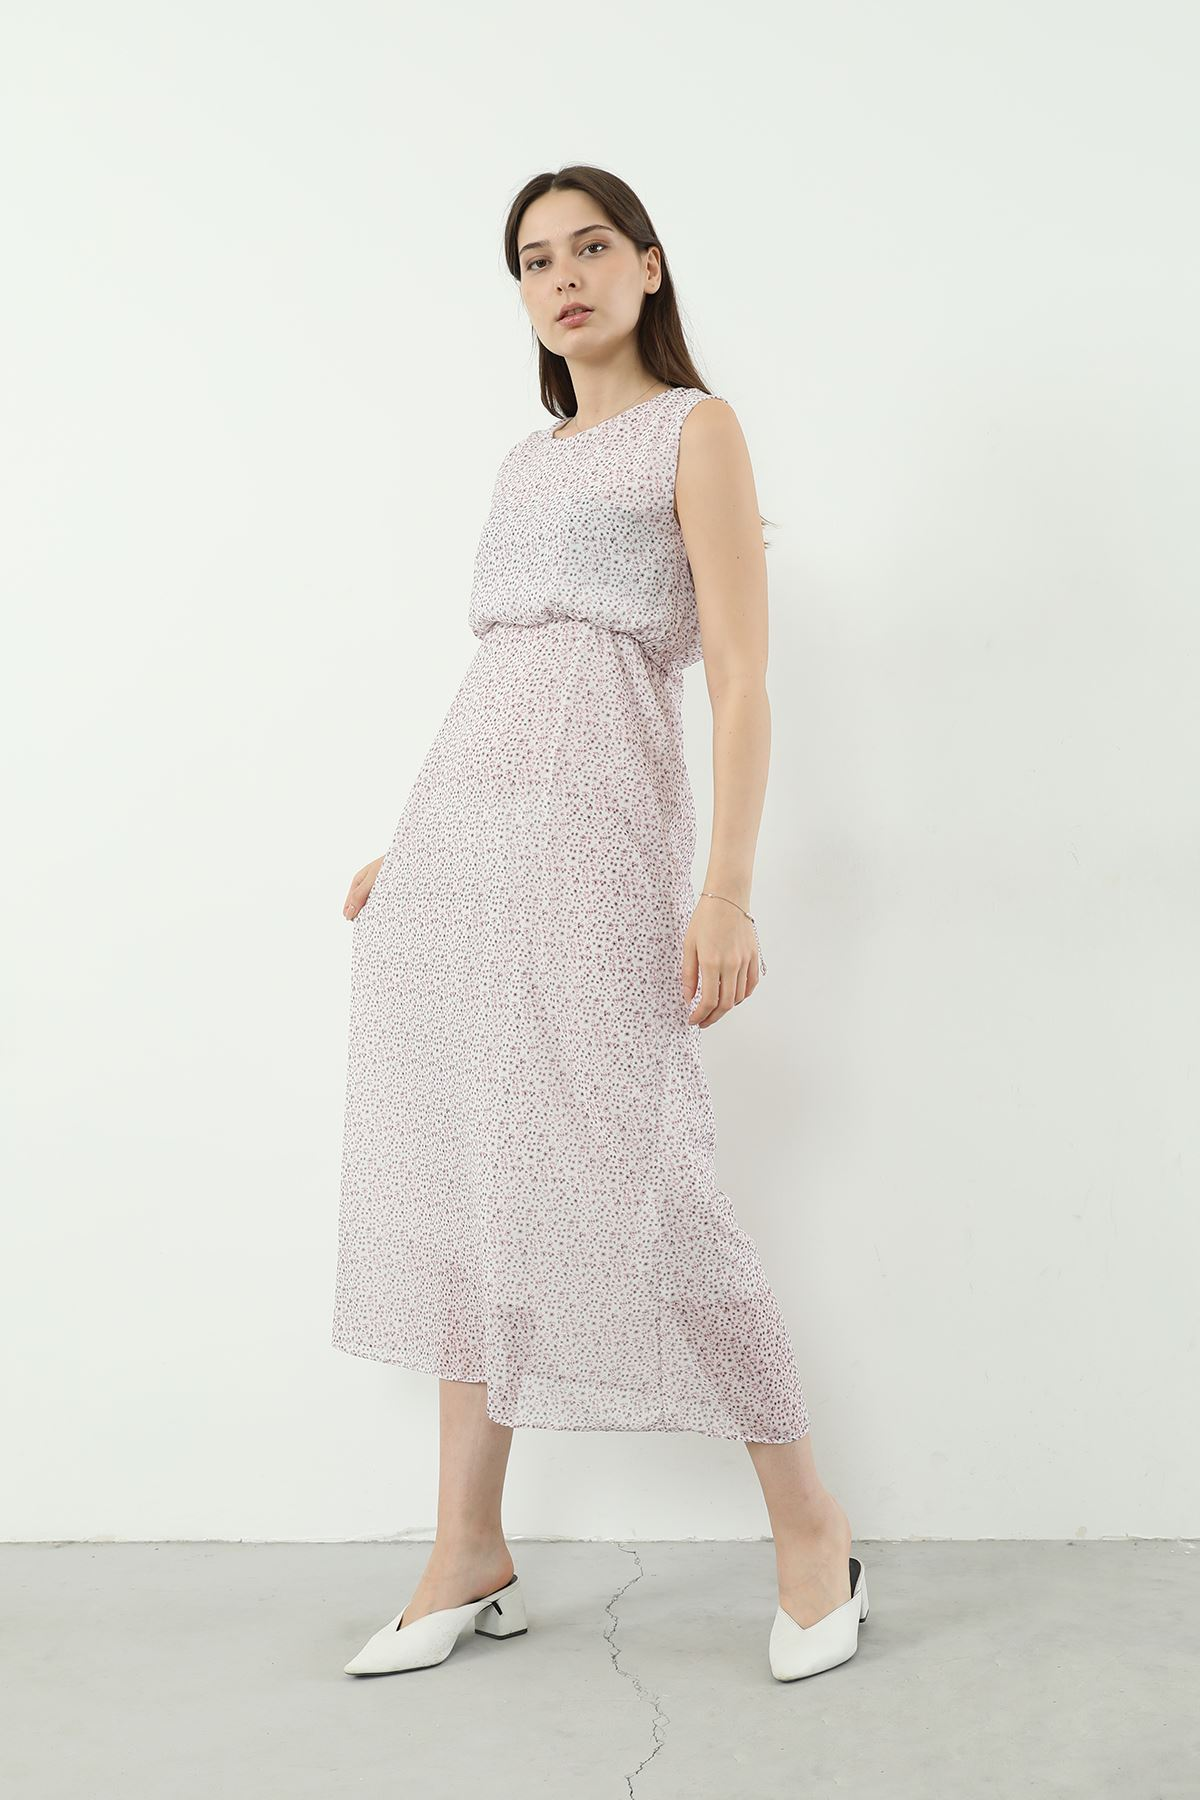 Sıfır Kol Şifon Elbise-Pudra